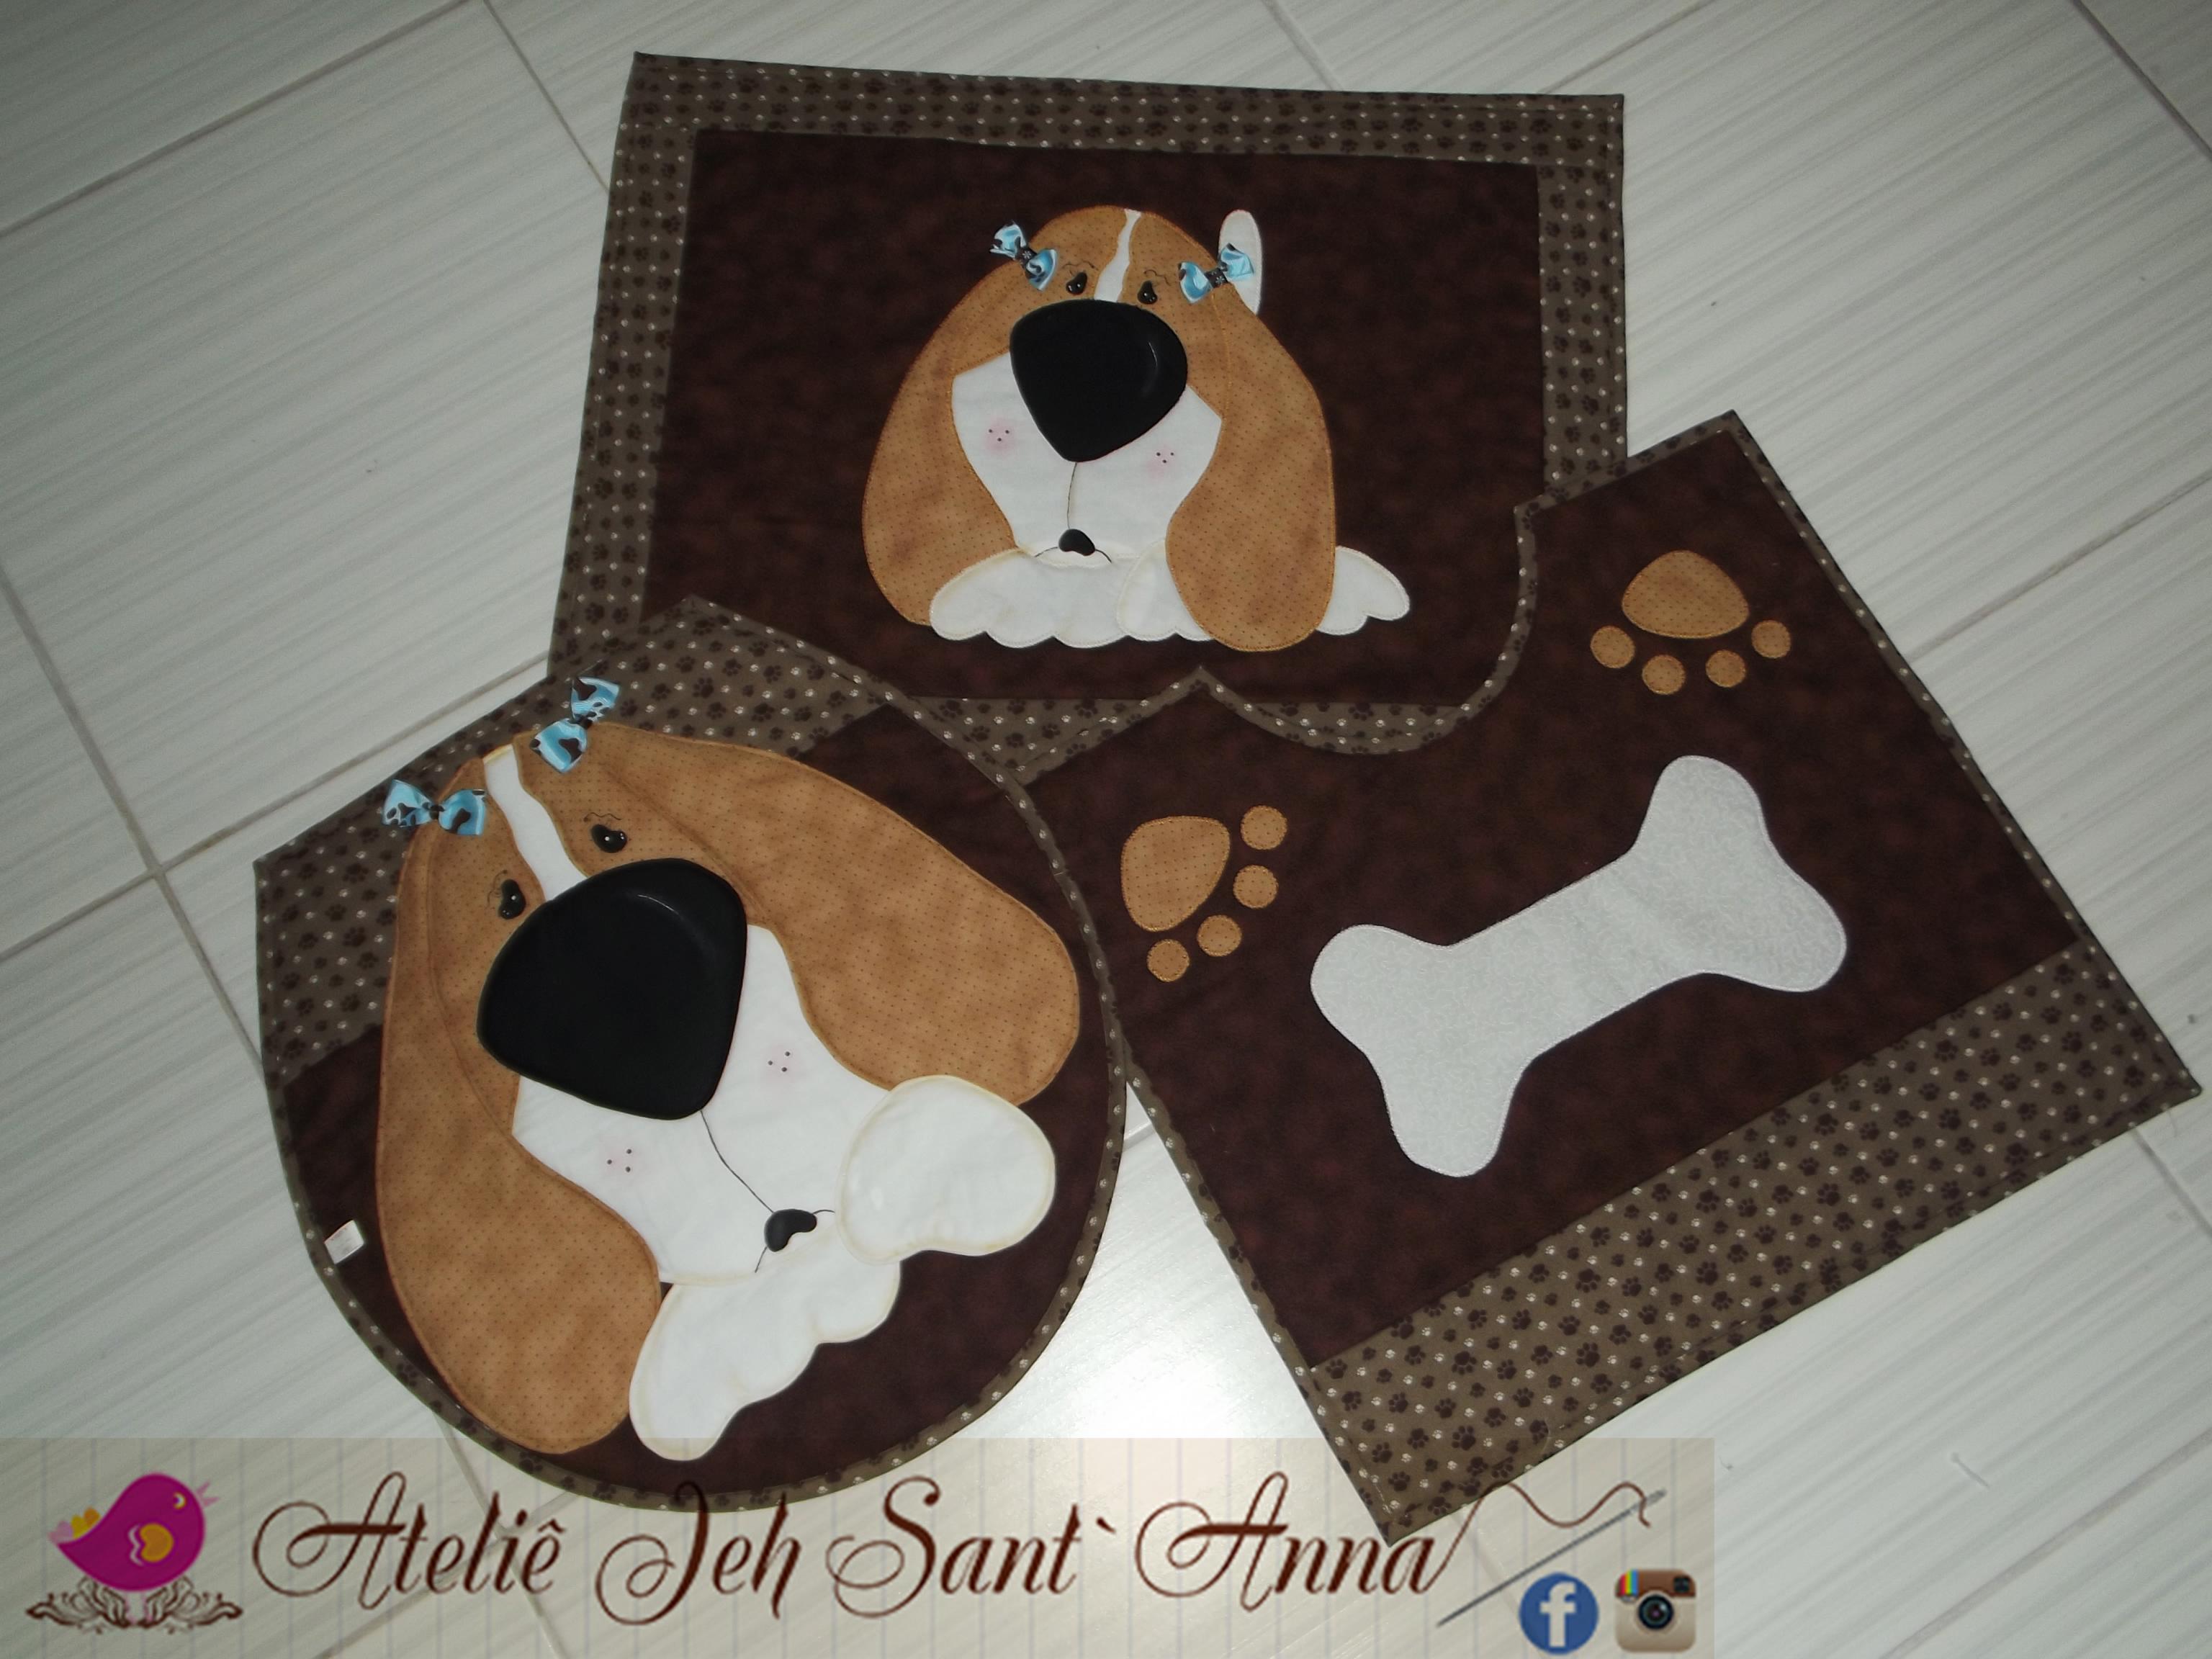 cachorro jogo de tapete cachorrinho tapete banheiro jogo de  #896240 3072x2304 Banheiro De Cachorro Funciona